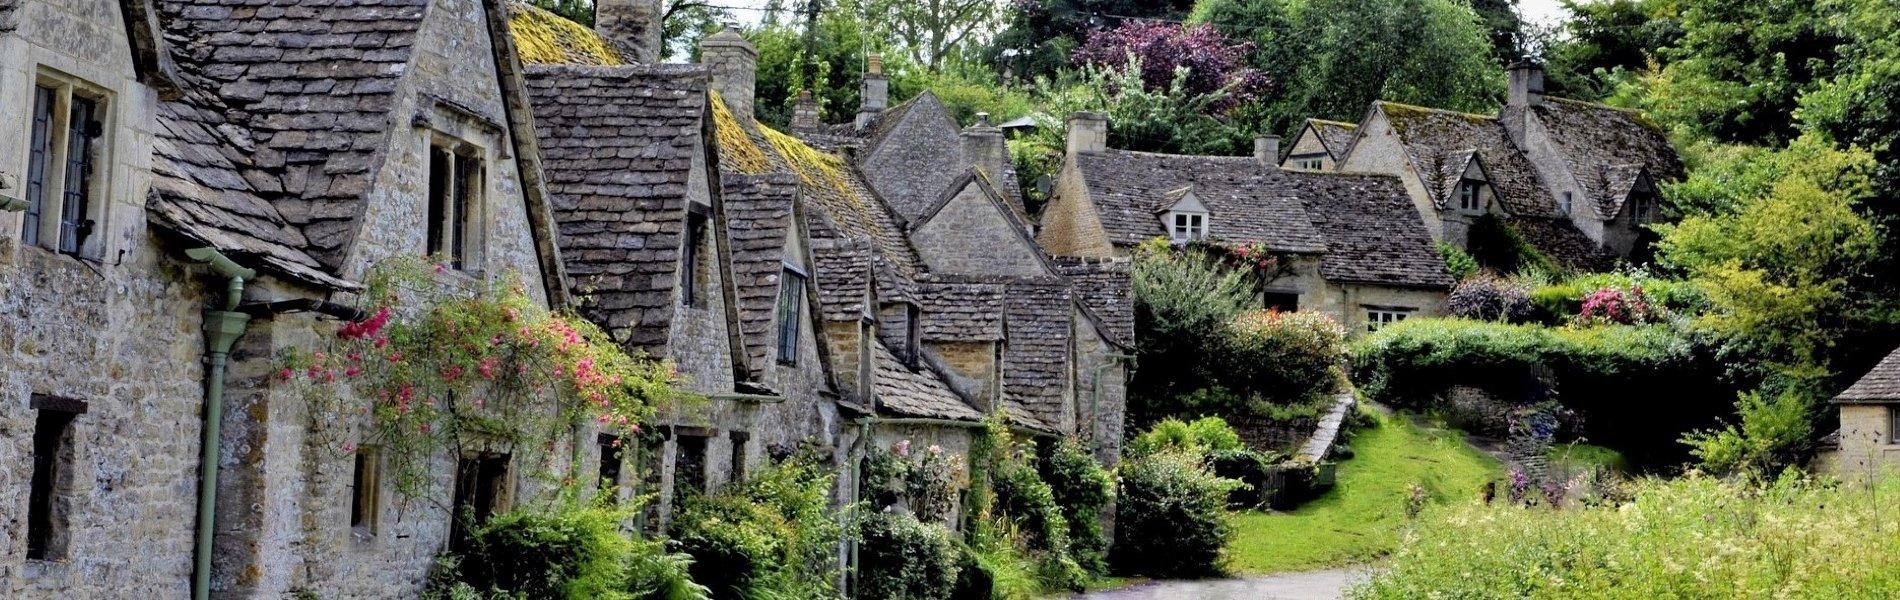 Bibury, Cotswolds, England